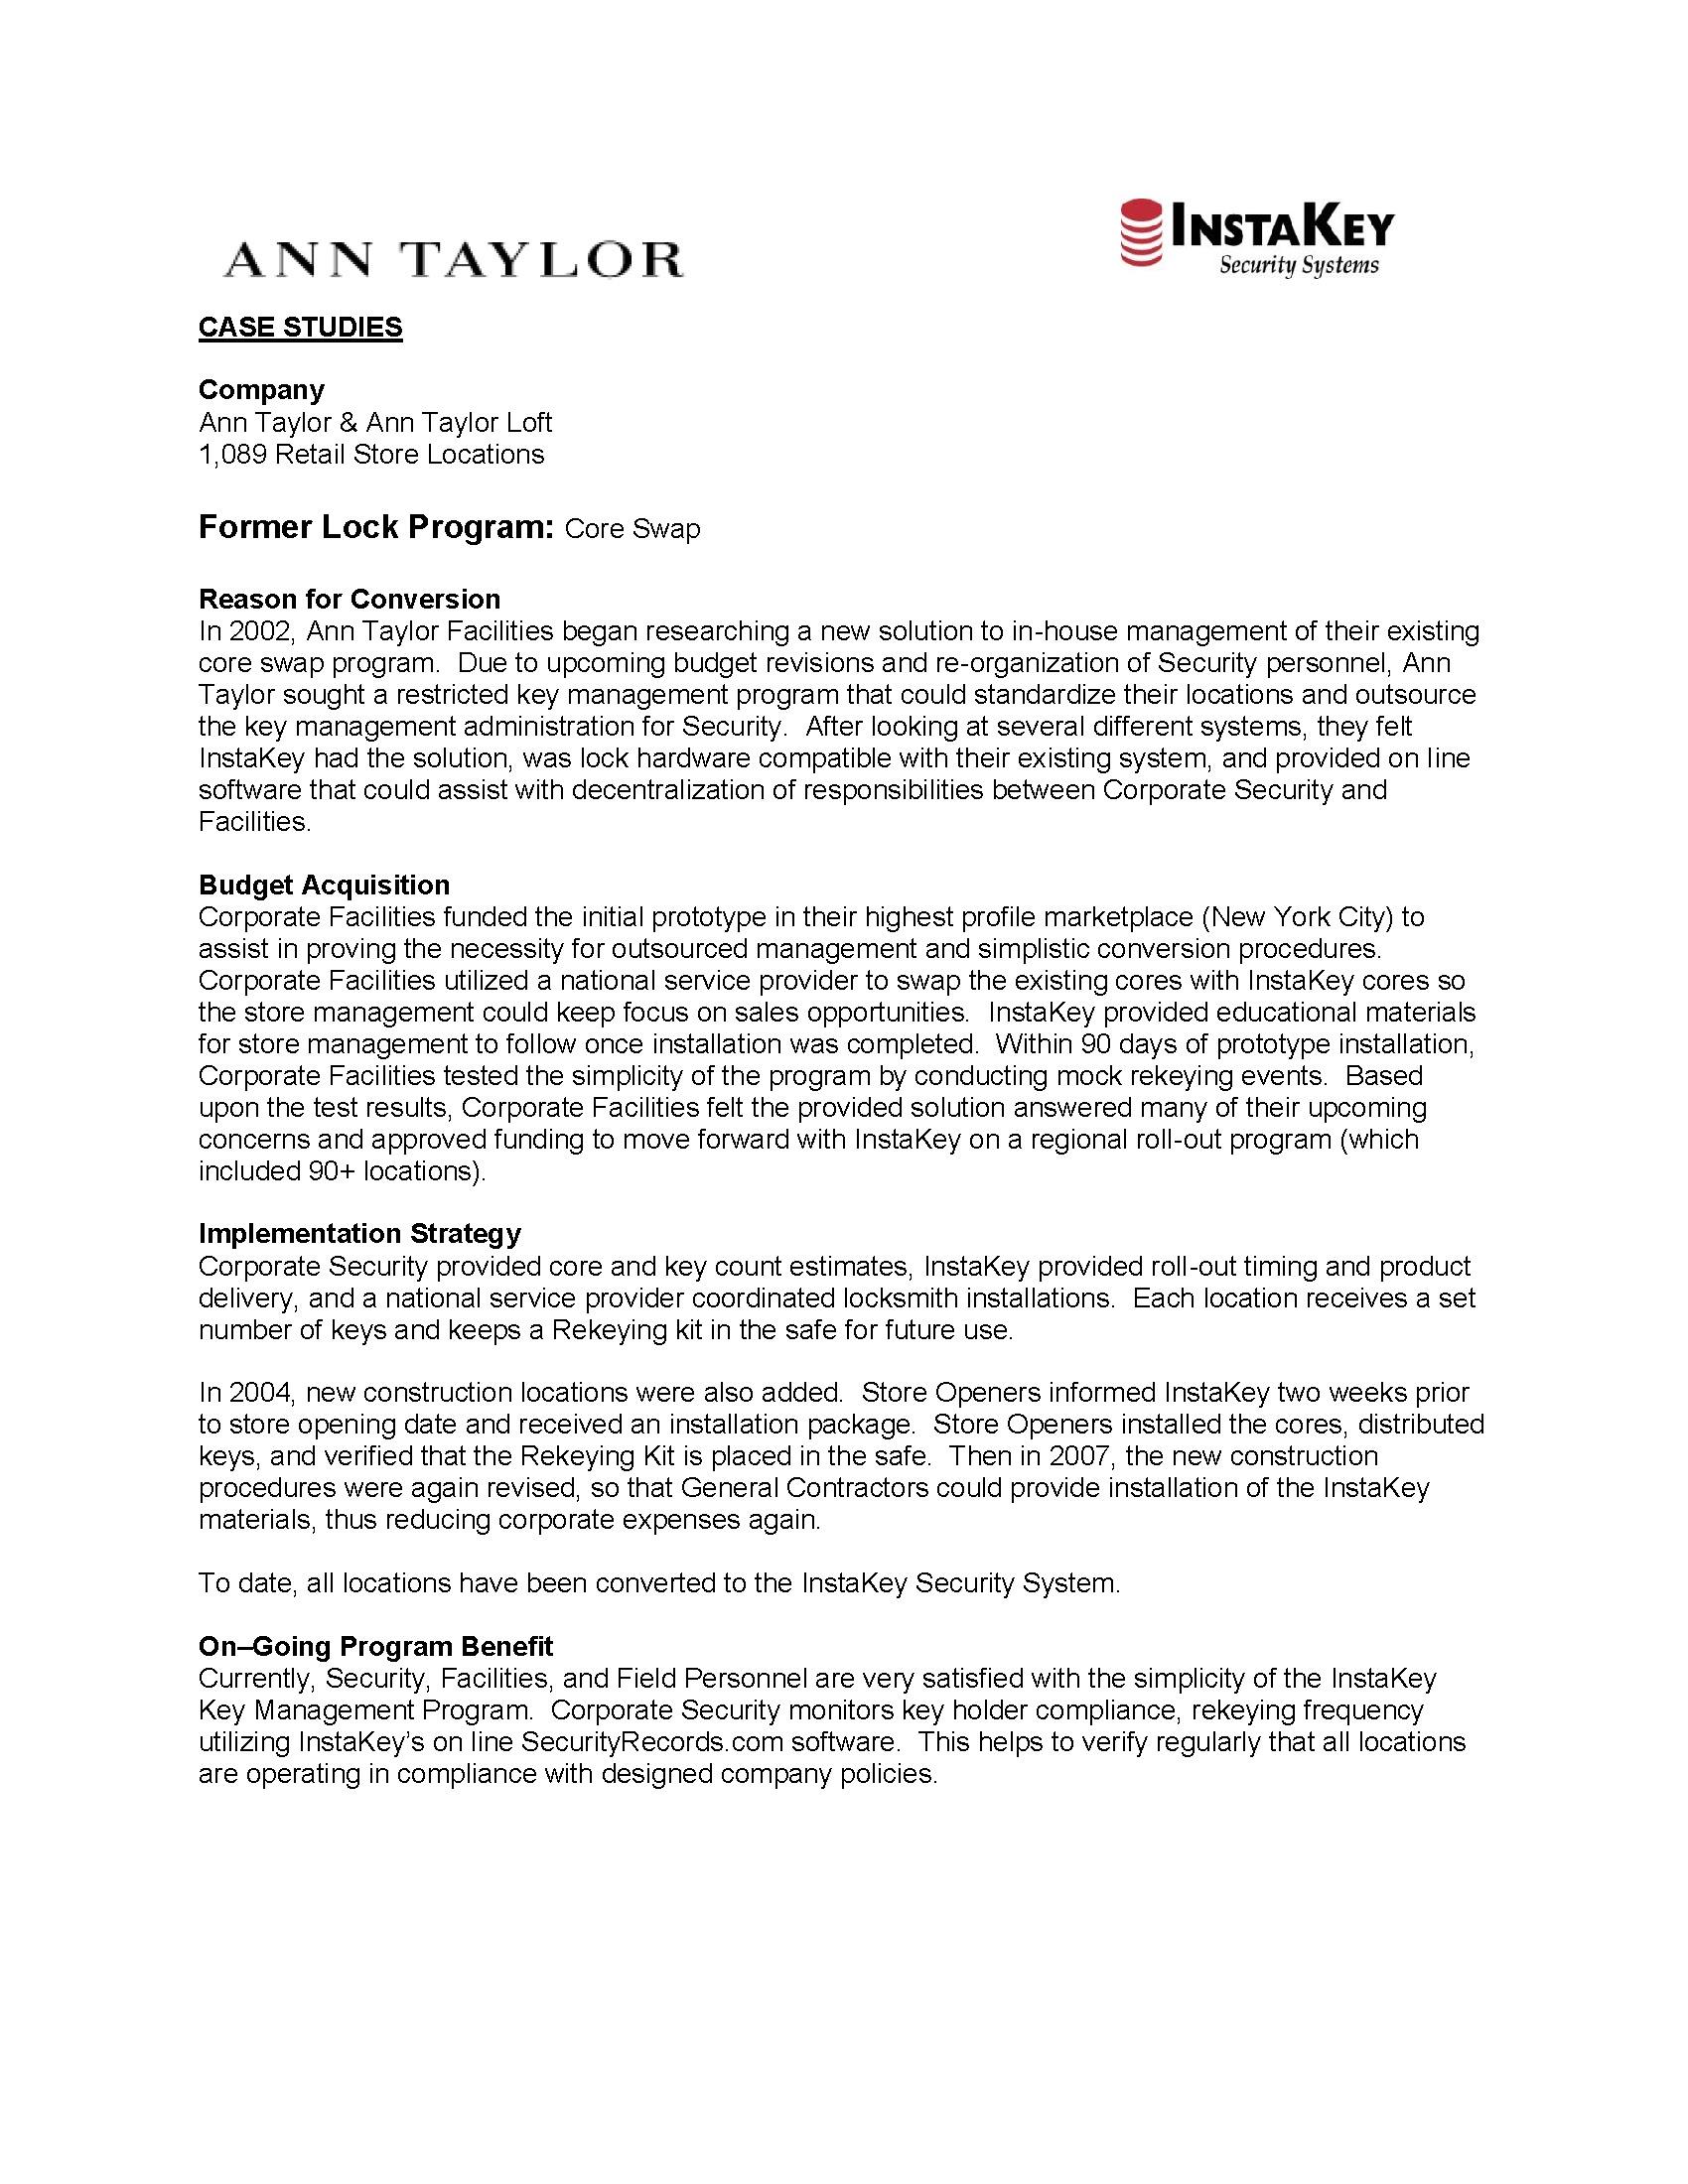 Ann Taylor – A Case Study